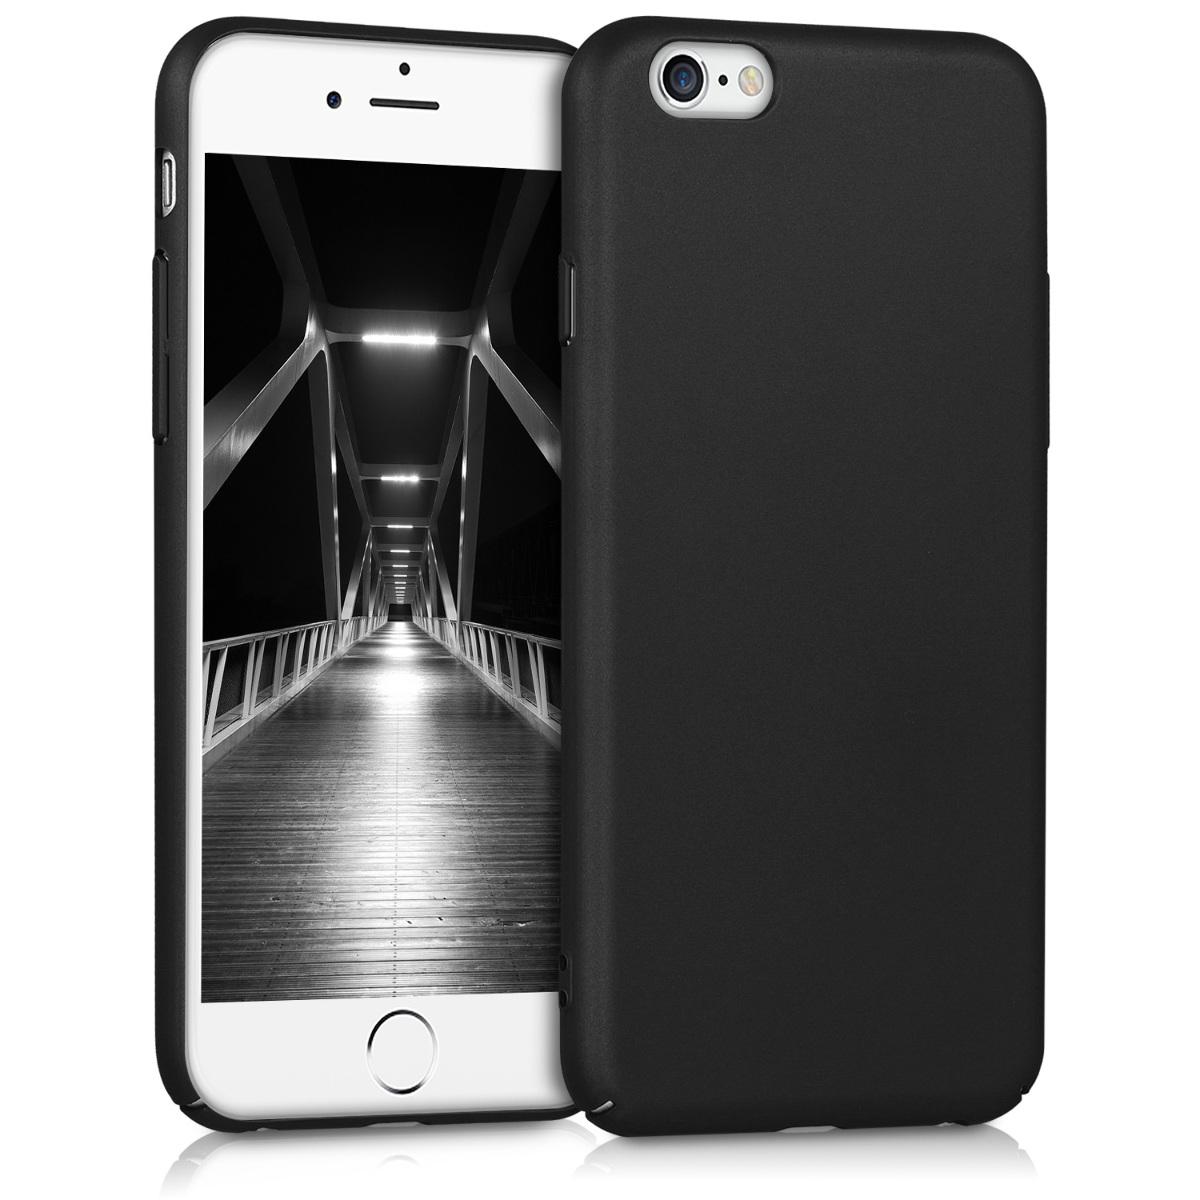 KW Slim Anti-Slip Cover - Σκληρή Θήκη Καουτσούκ iPhone 6/6s - Μαύρο (43258.47)